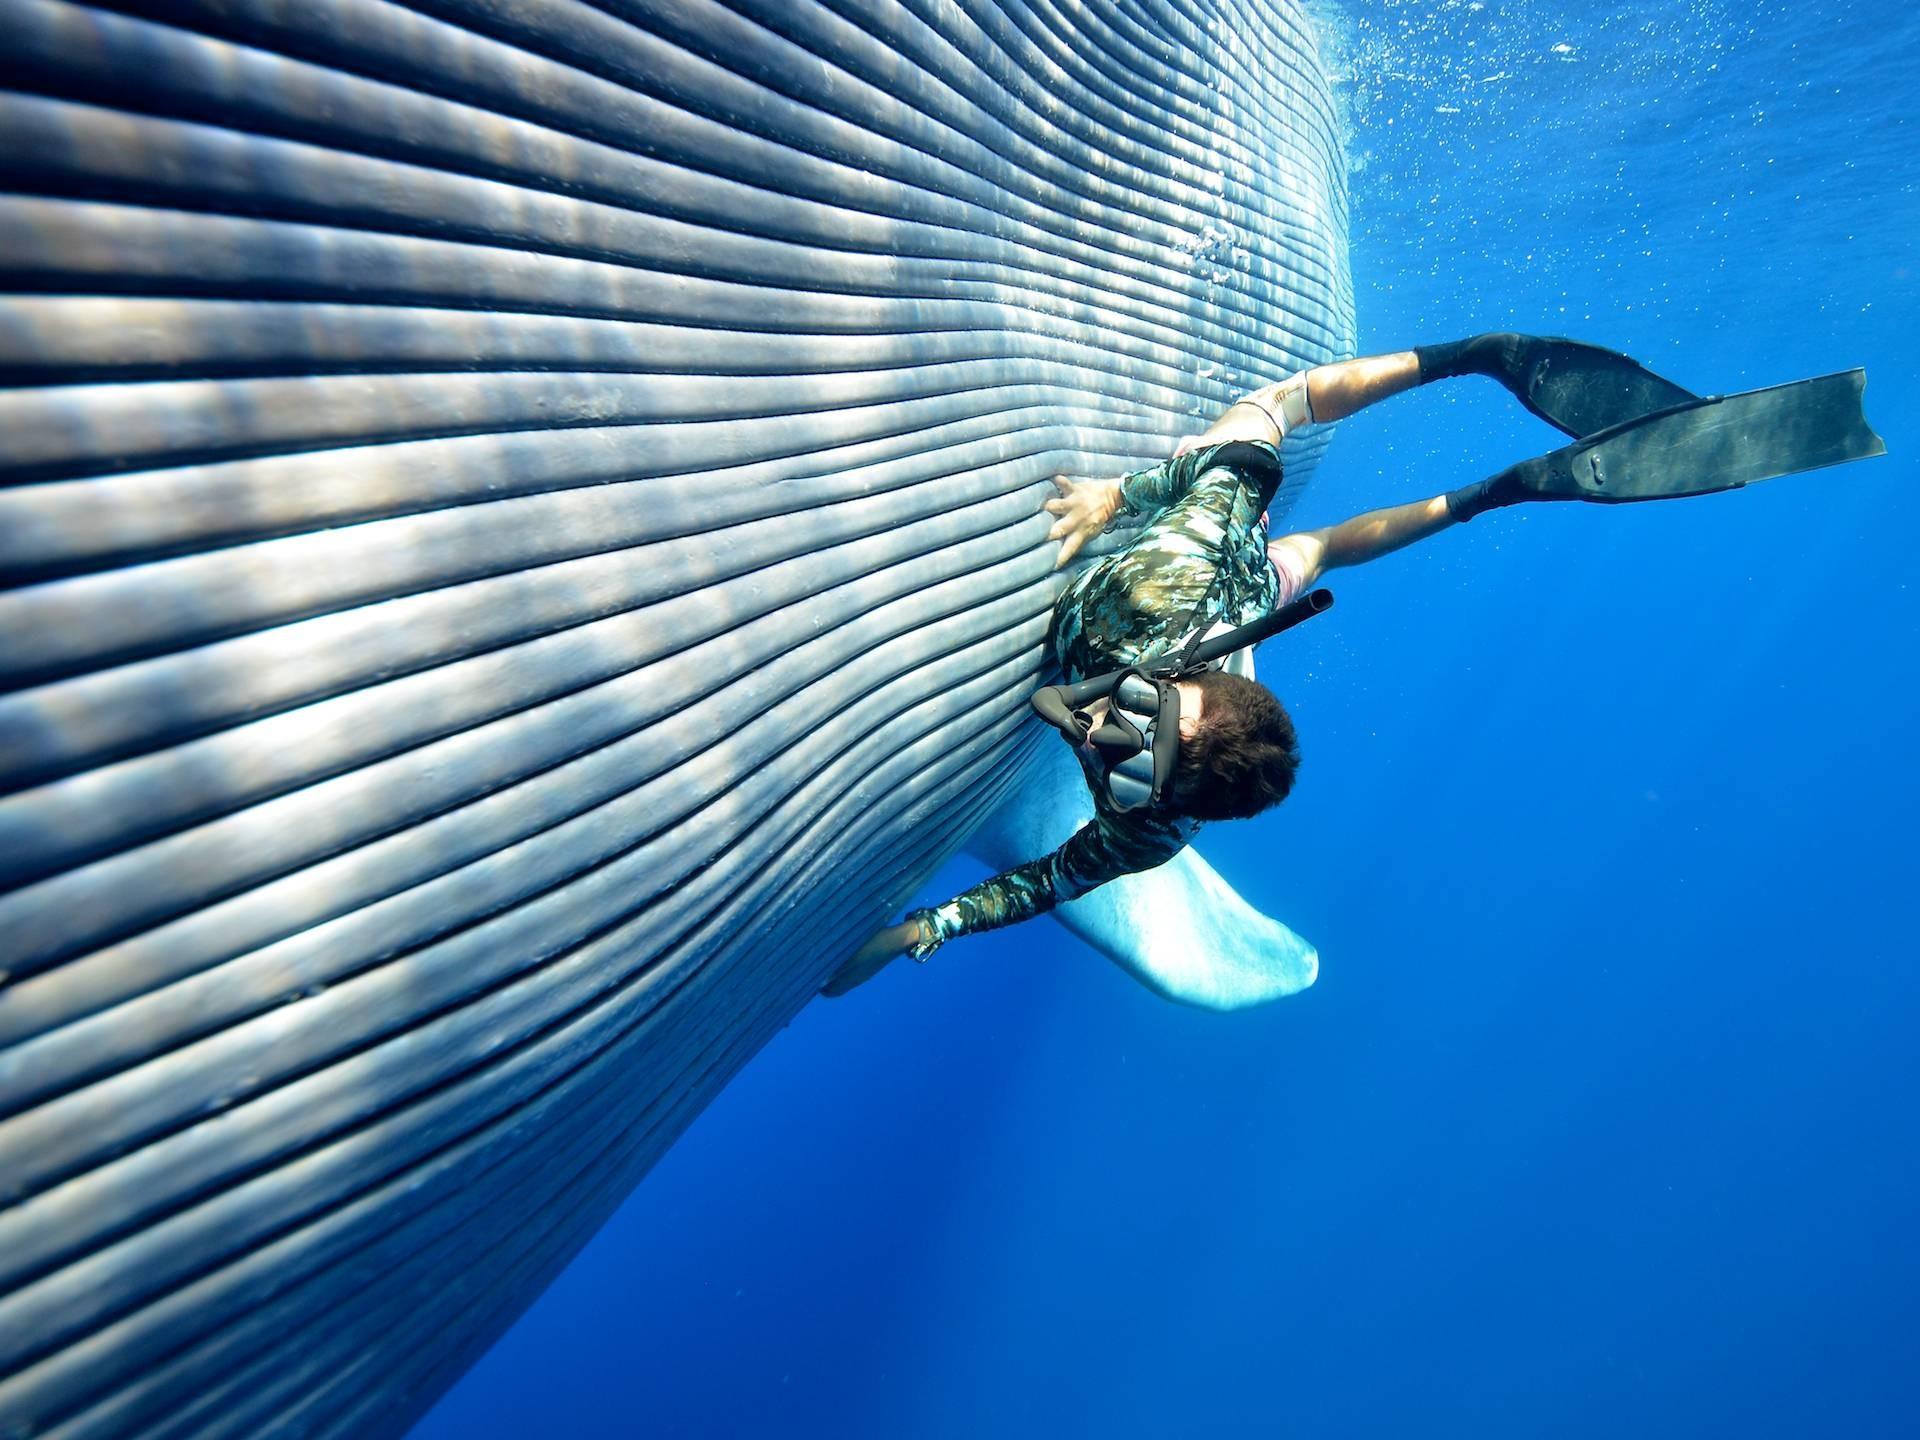 Blue Whale Wallpaper 60 Images